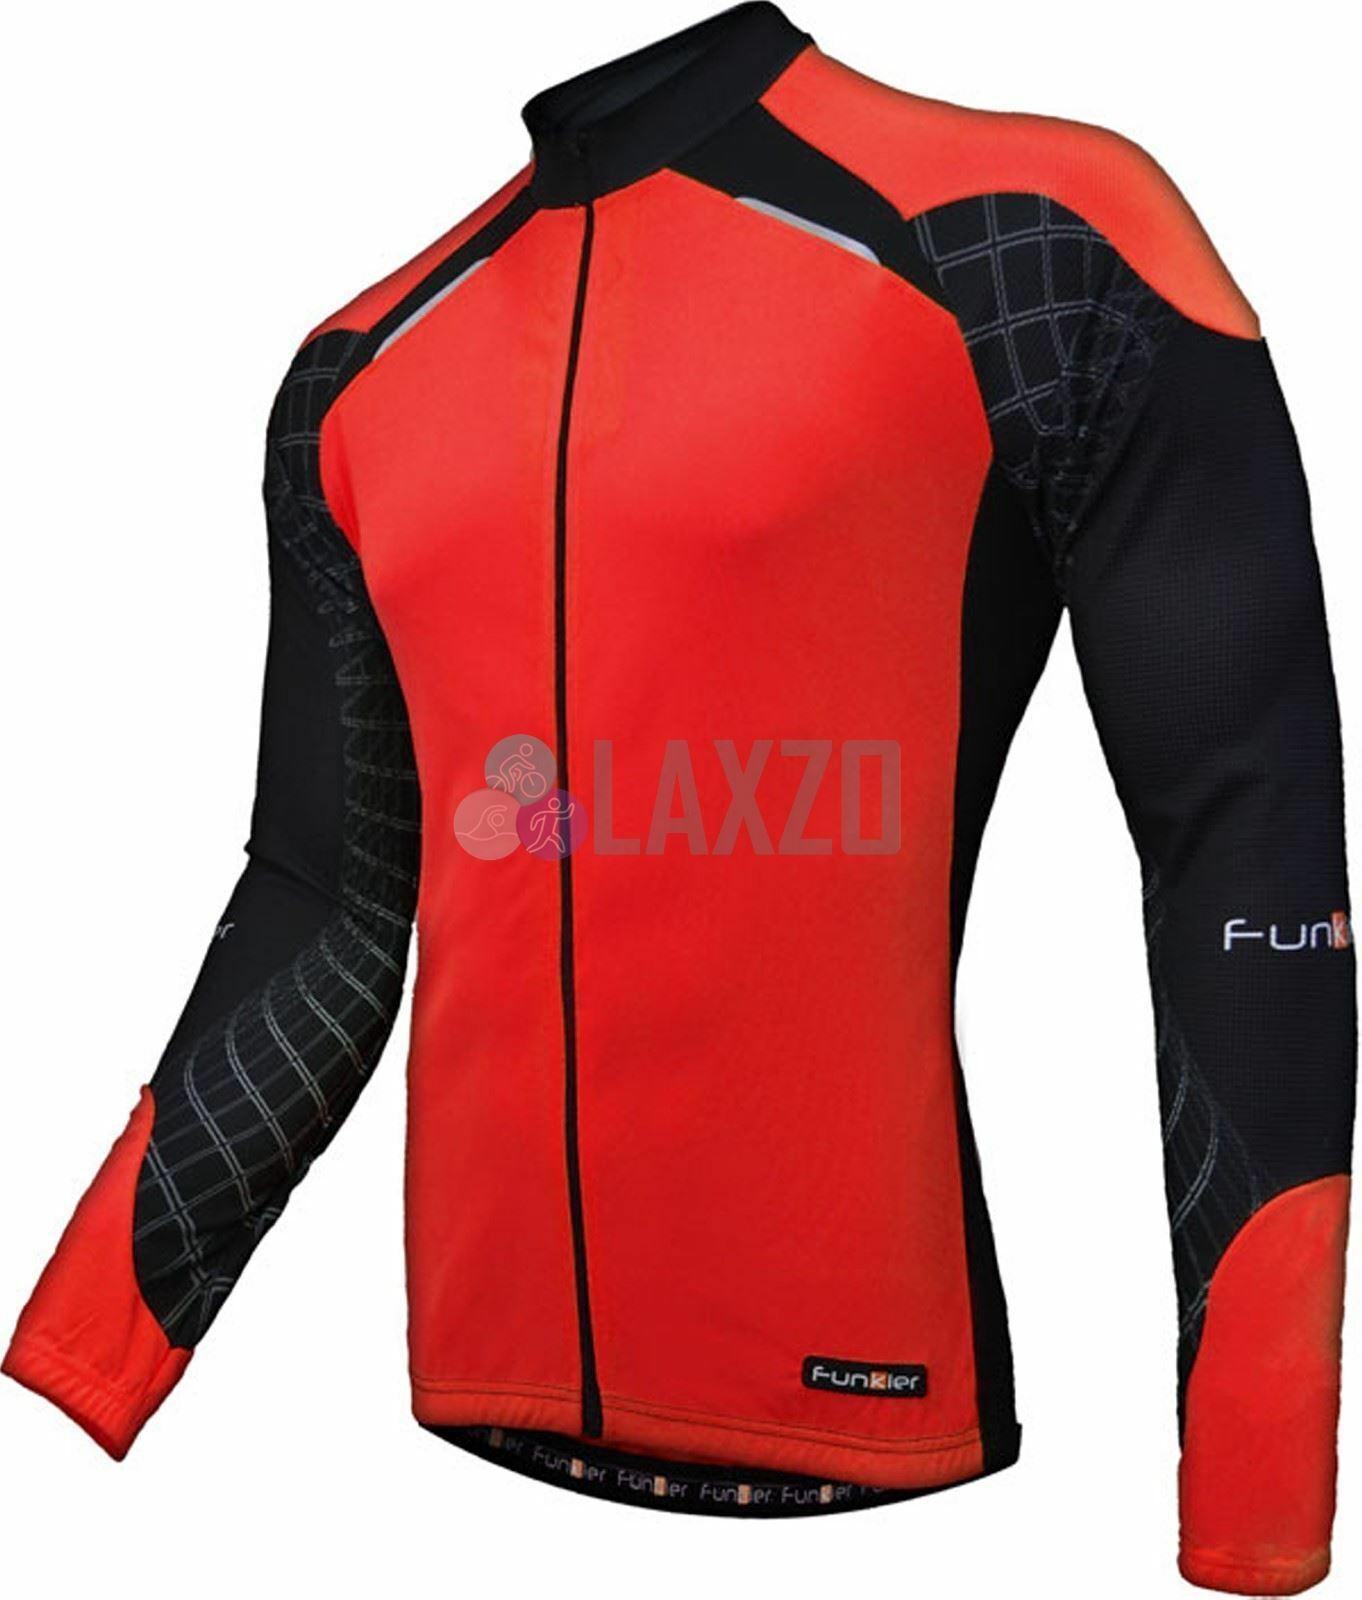 Funkier Fuerza J 730K 1 LW Niño Manga Larga Jersey en Rojo Negro Pequeño (Edad 8